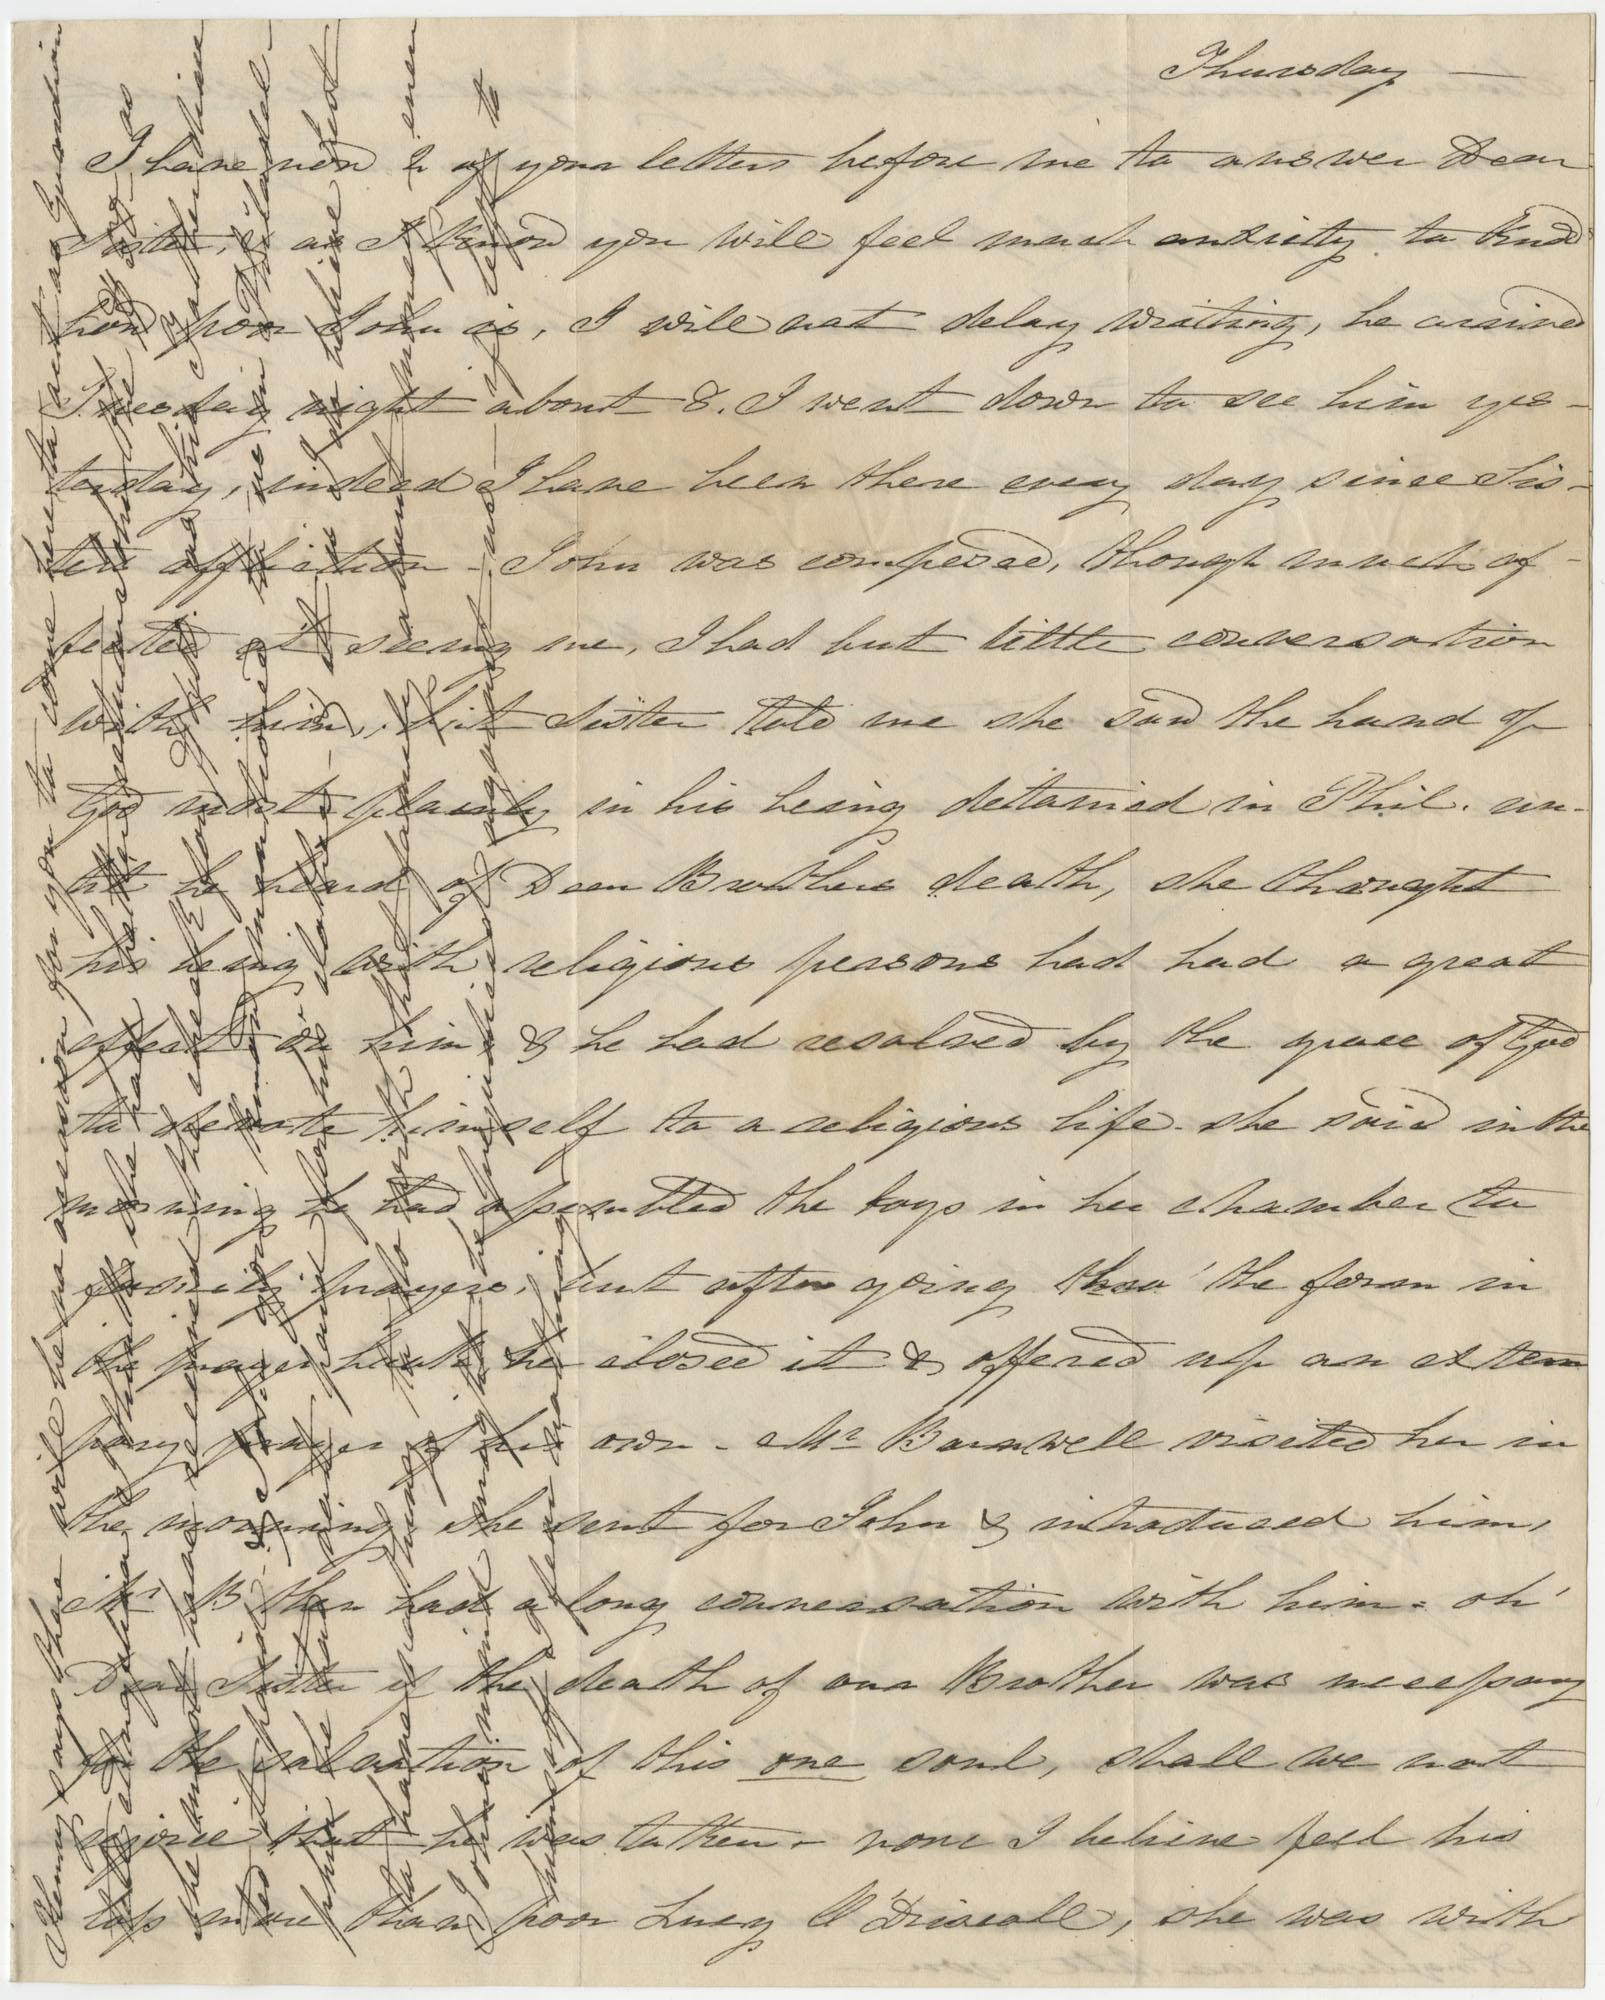 Letter to Angelina Grimke and Anna R. Frost from Elizabeth Caroline Grimke, 1834